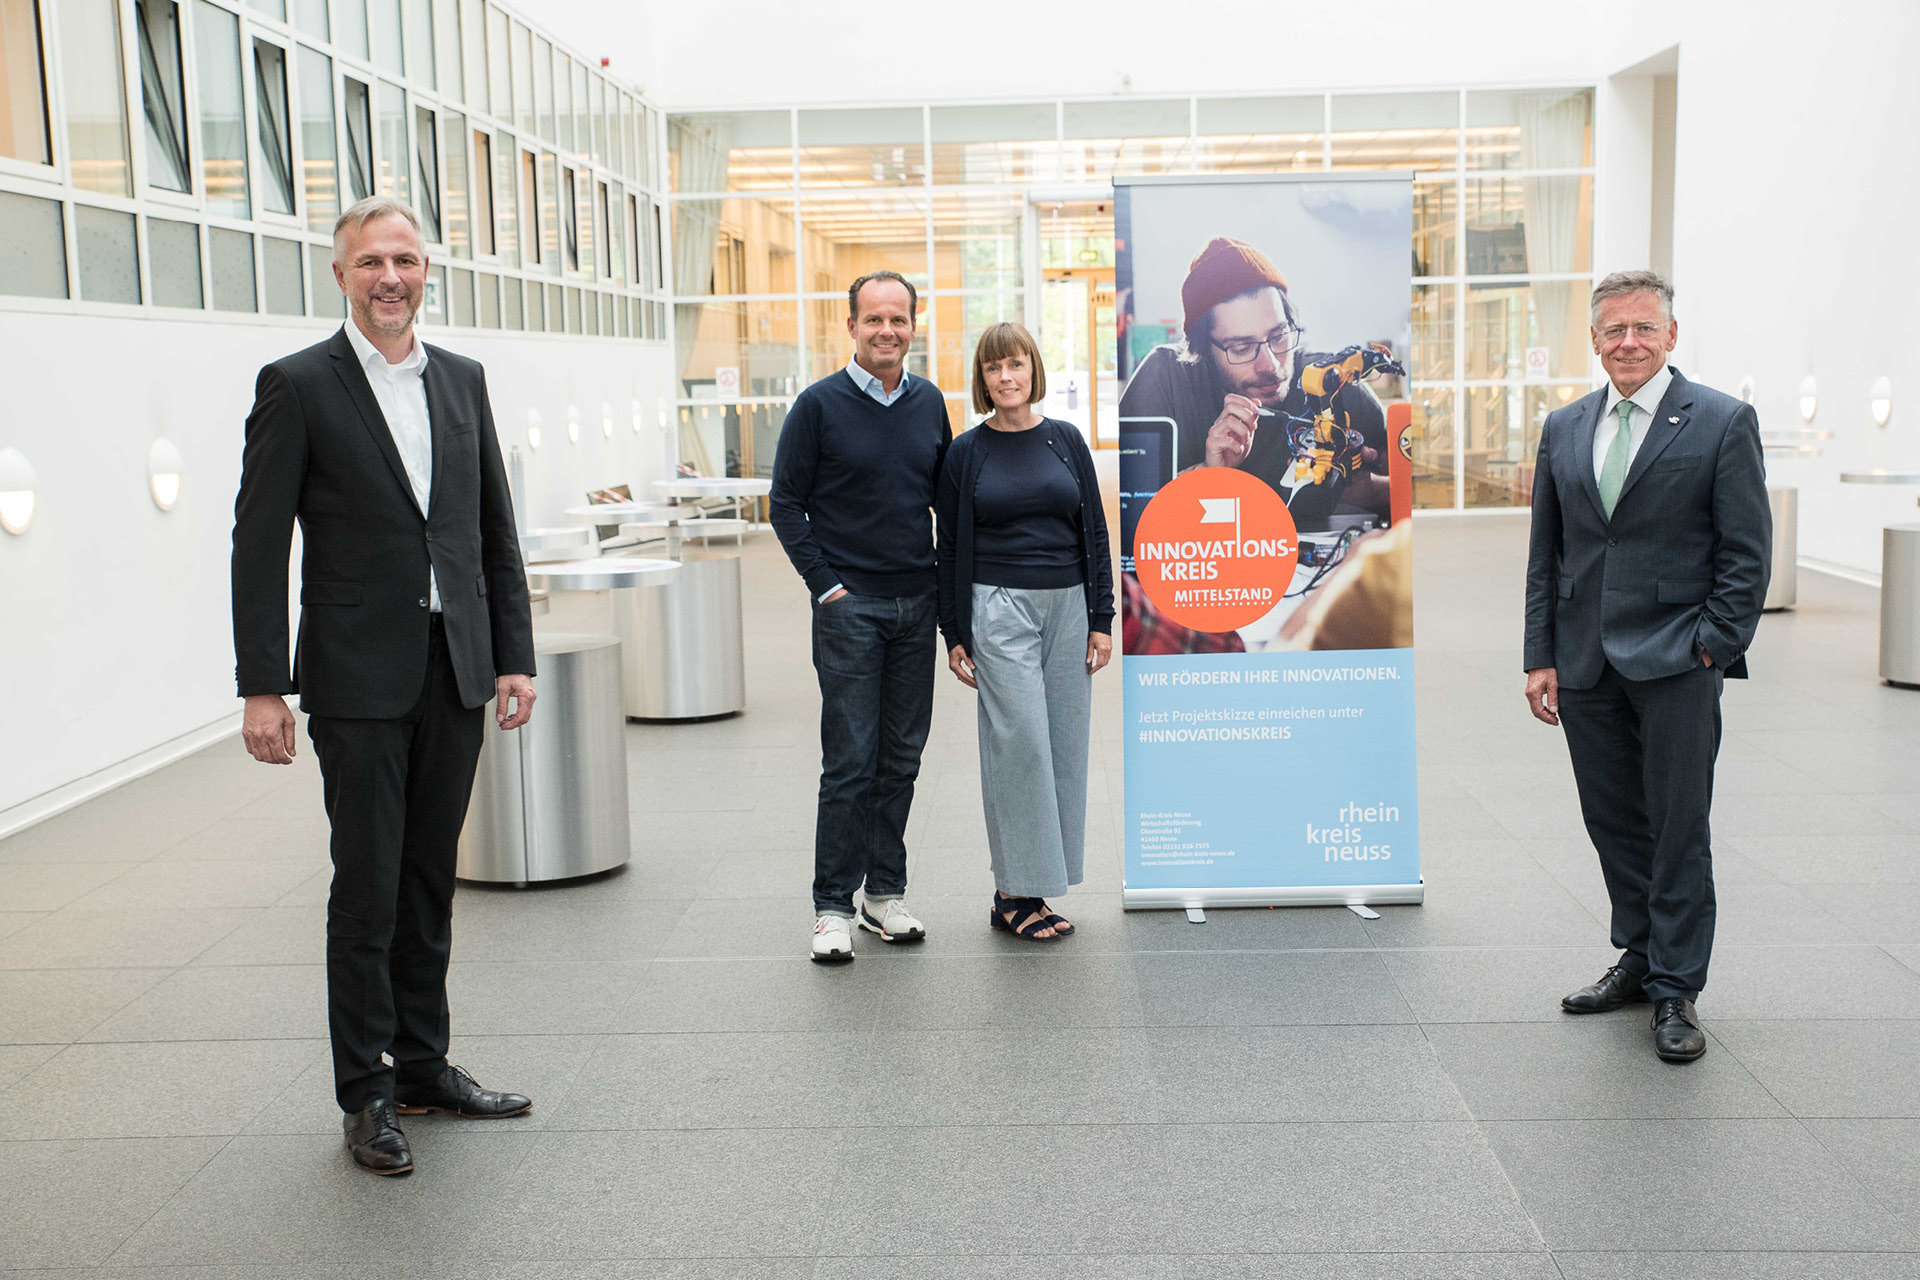 Kreisdirektor Dirk Brügge, Prof. Dr. Günter Huhle und Carola Petri (COREVAS), Landrat Hans-Jürgen Petrauschke (v.l.)